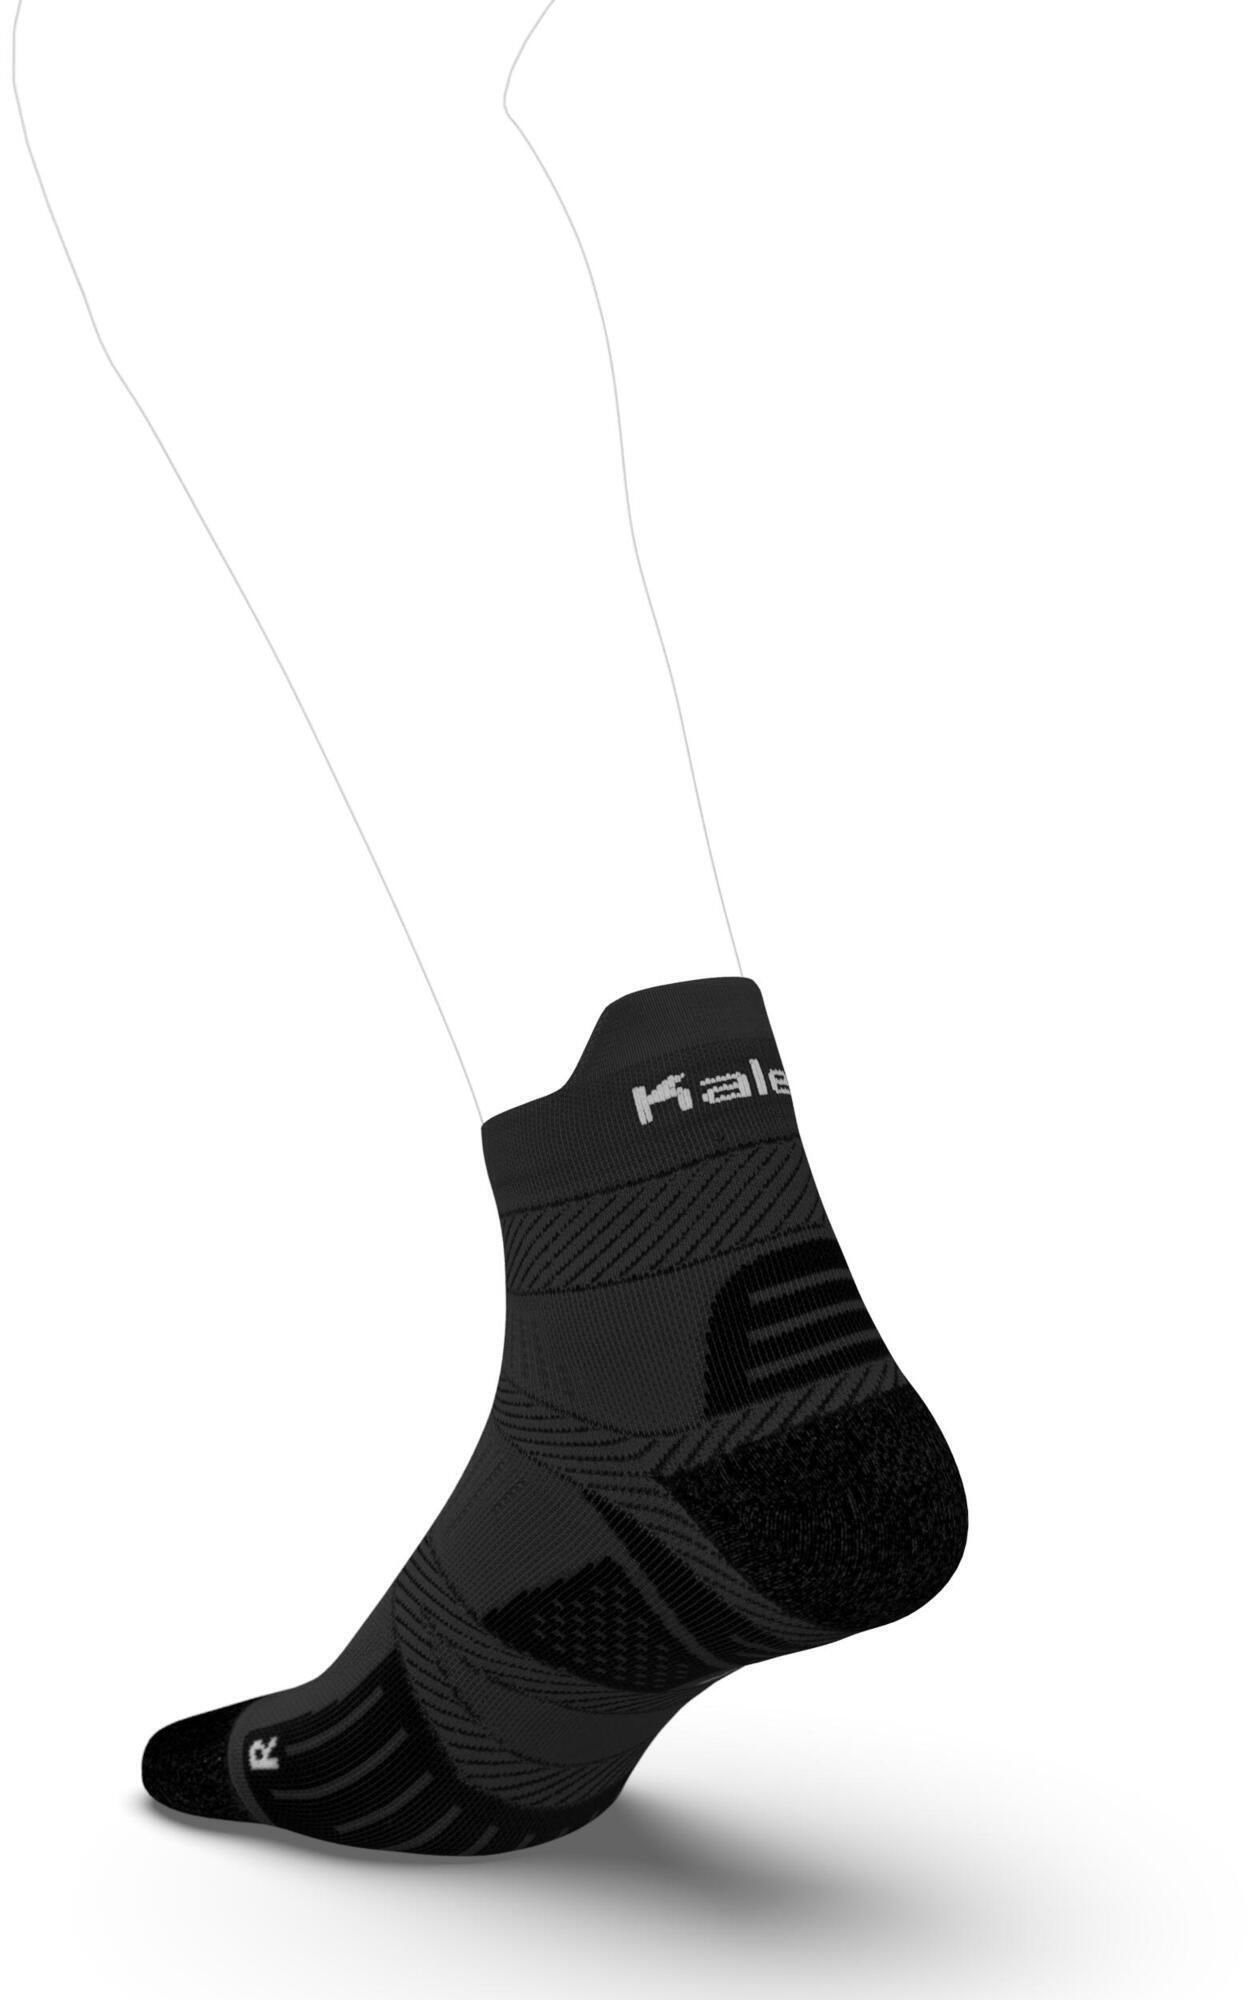 Skarpetki do biegania Kiprun Strap Thin średnie